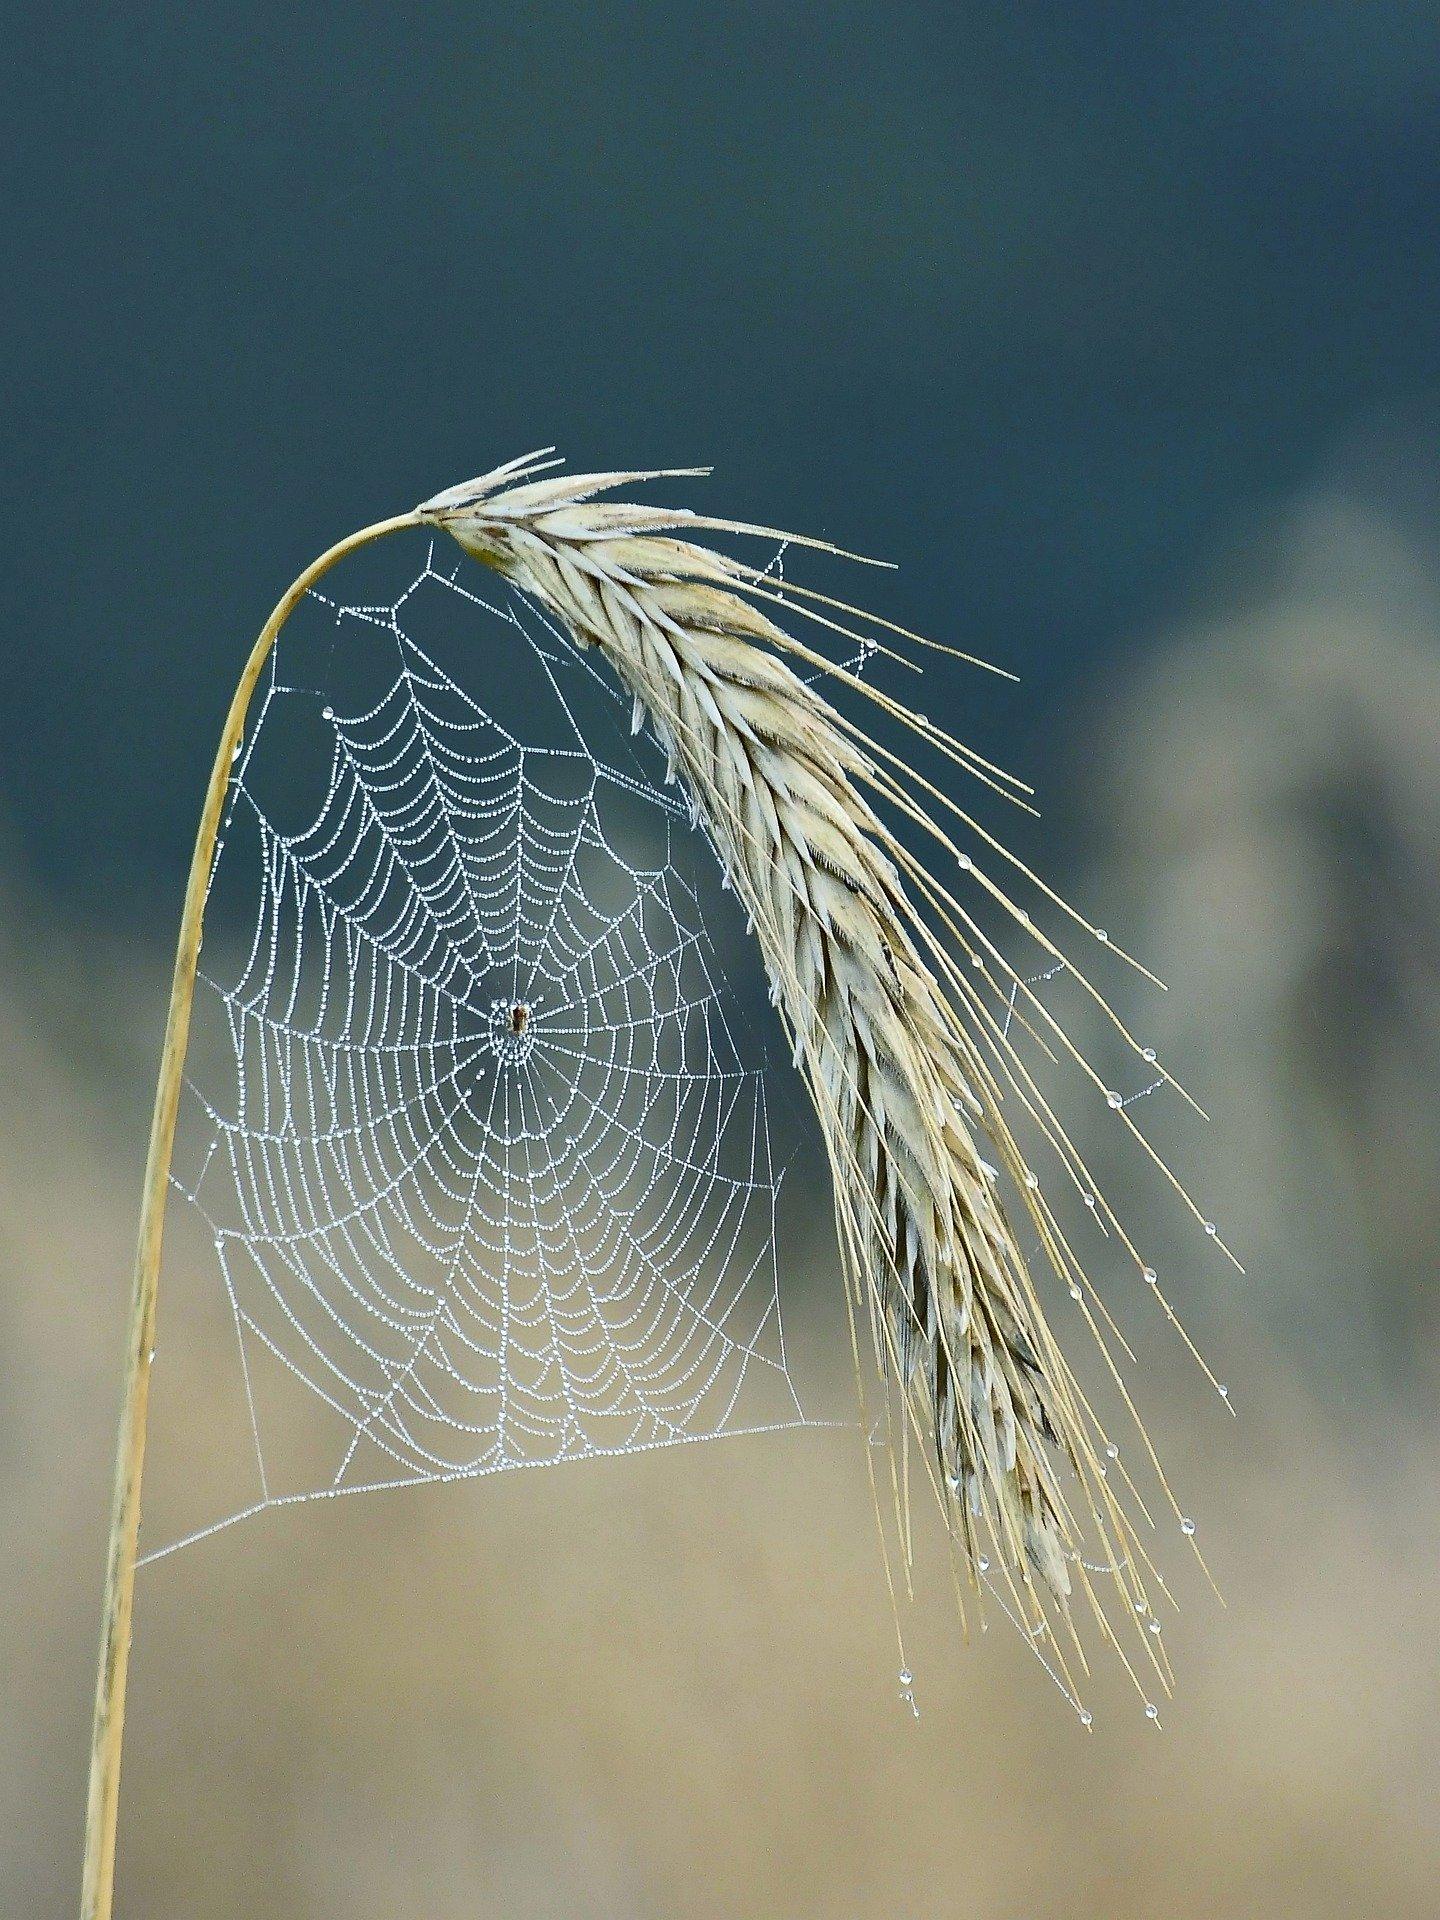 cobweb-5547626_1920